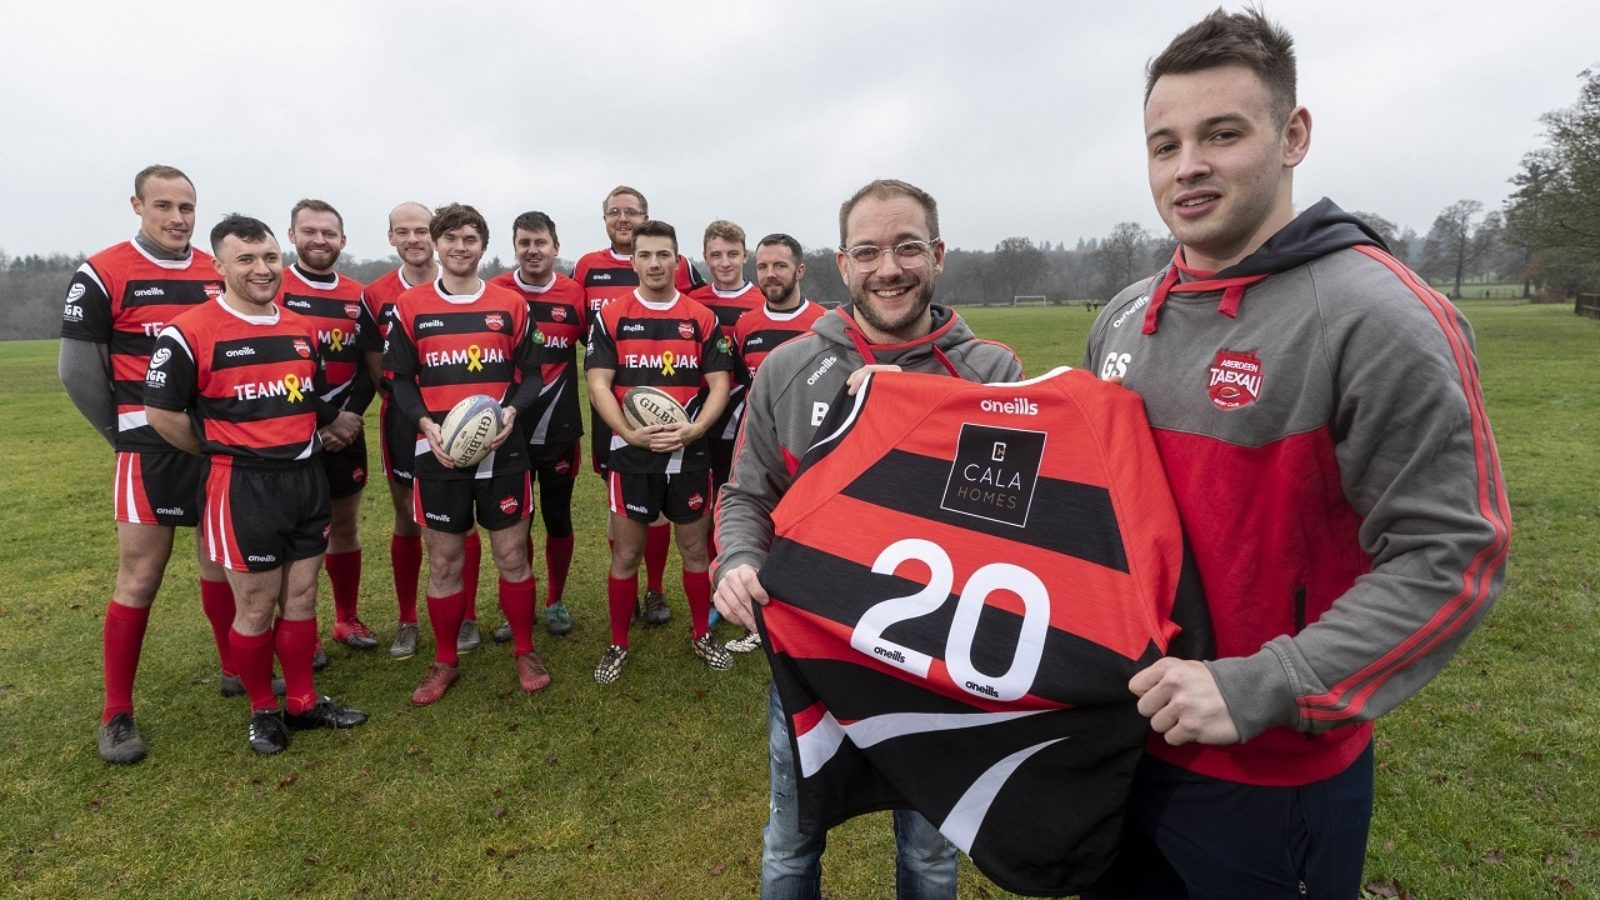 Aberdeen Taexali Rugby Club, who were awarded CALA Community Bursary funding back in 2019